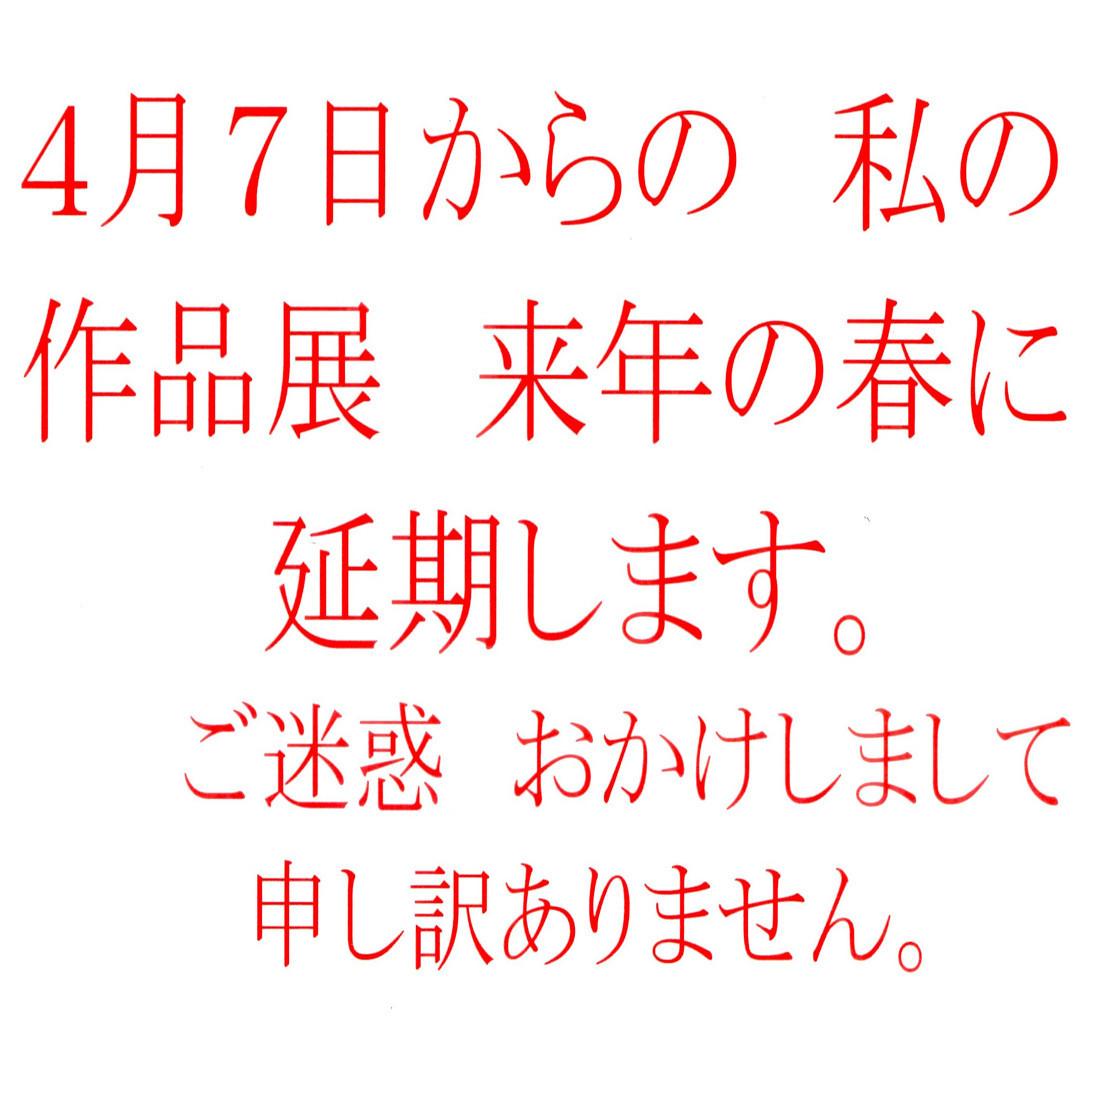 f:id:morinui:20200326130516j:plain